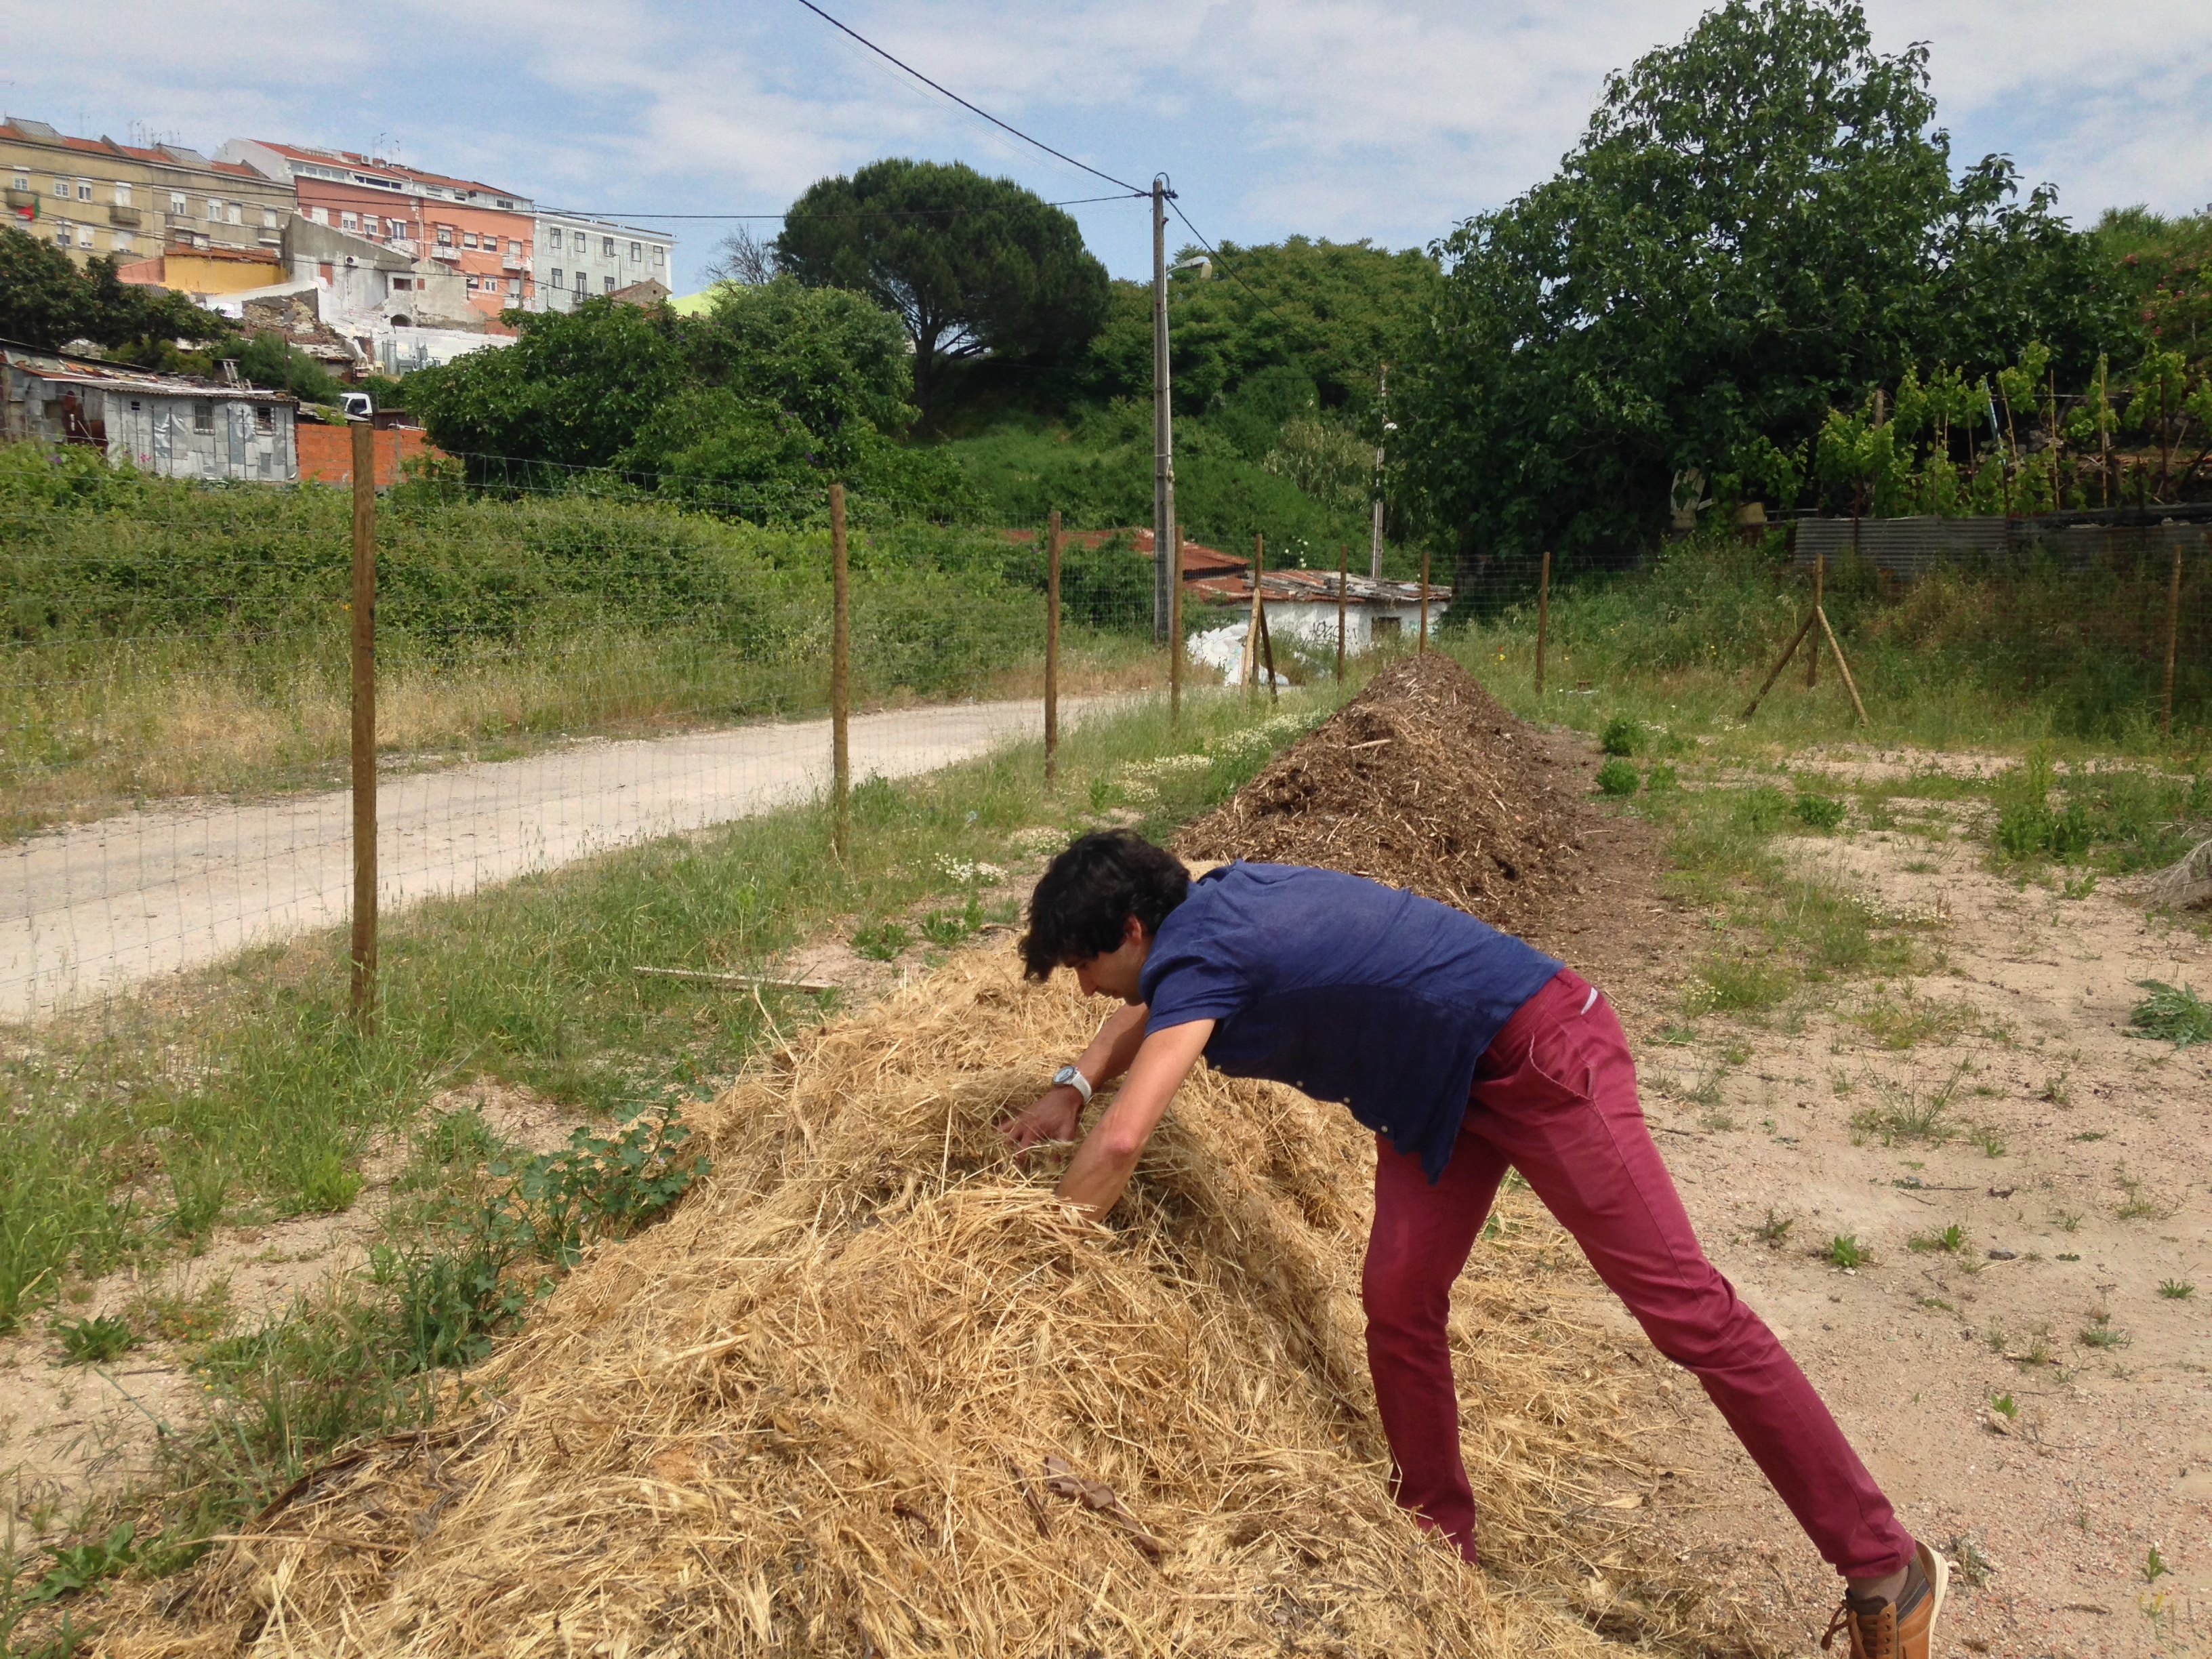 Community Gardens in Campolidein Lisbon, Bip/Zip project. Photo (cc) Eutropian